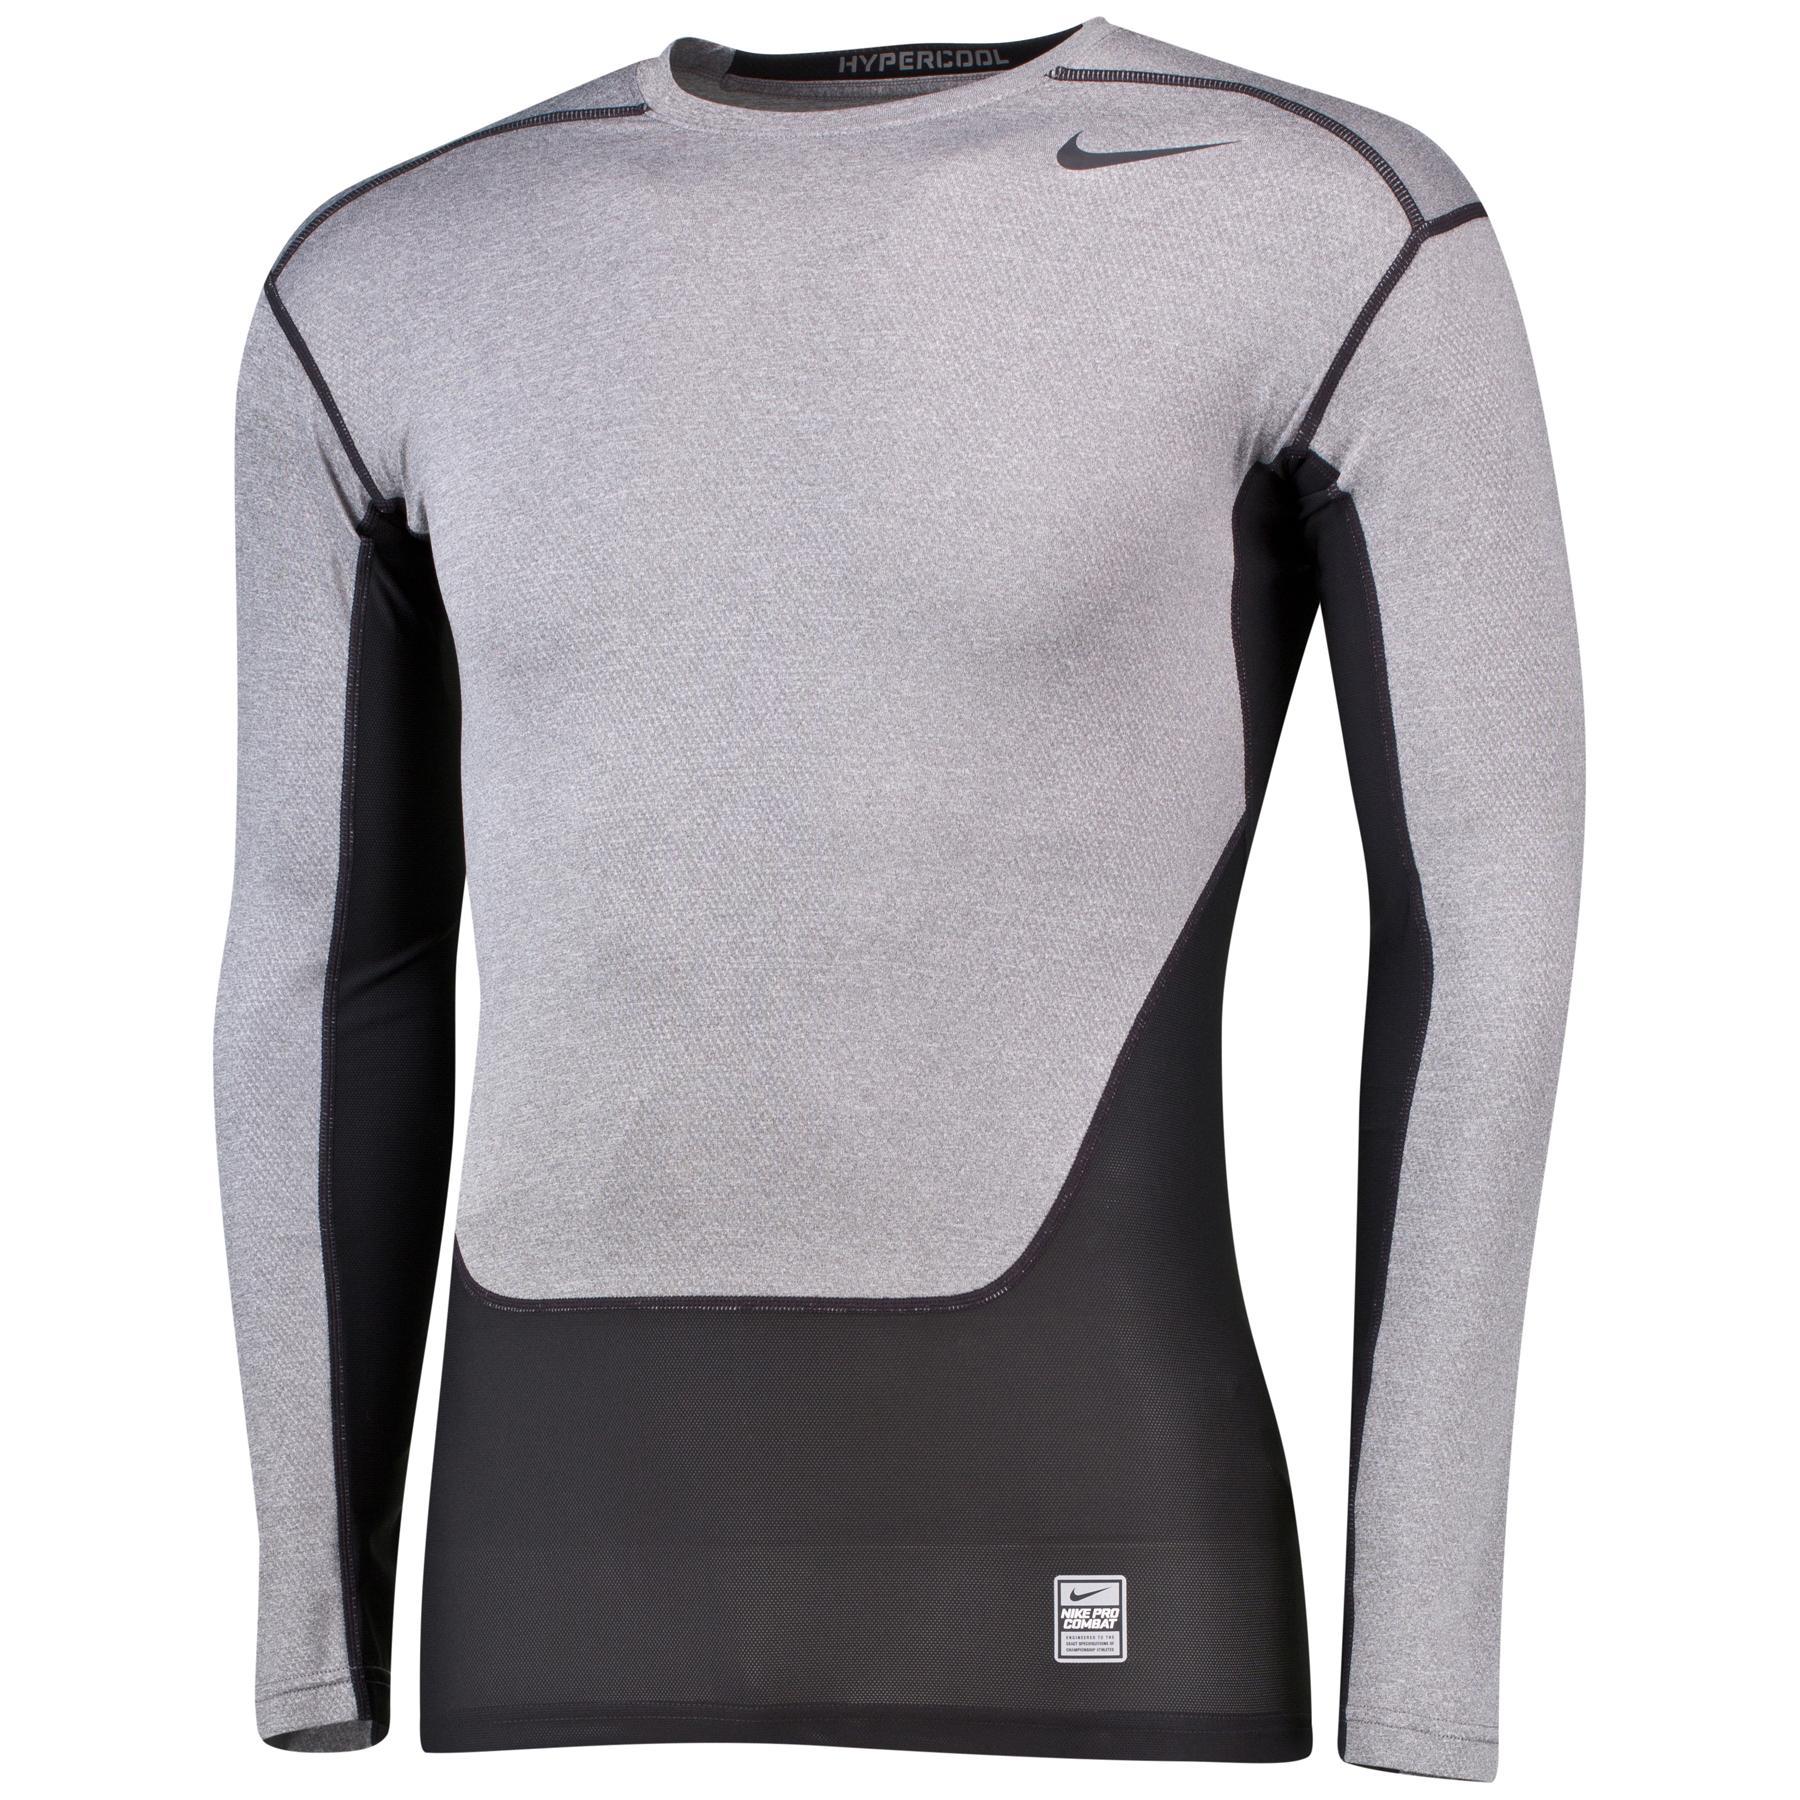 Nike Pro Combat Hypercool Compression Baselayer Top - Long Sleeve Grey